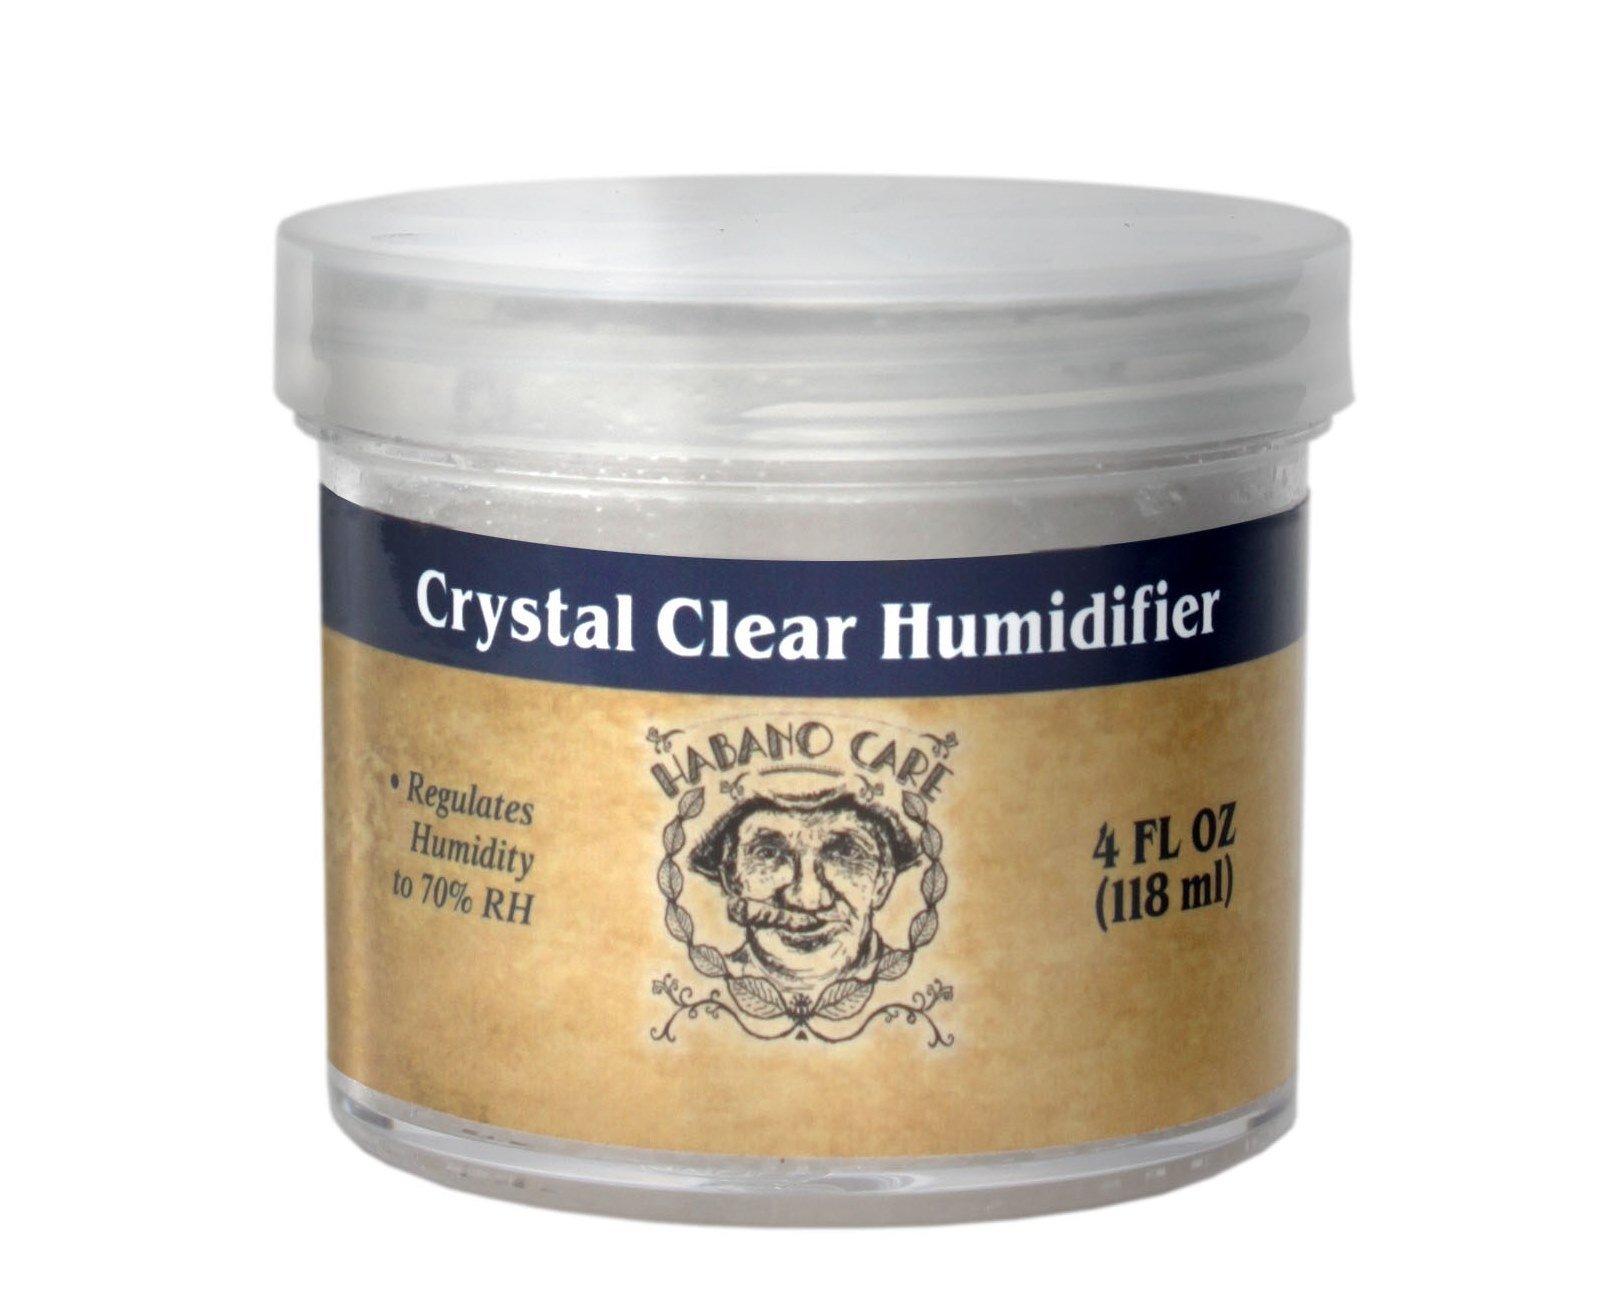 Habano Care - Crystal Clear Cigar Humidor Humidifier Jar 4 oz Gel Humidification Beads